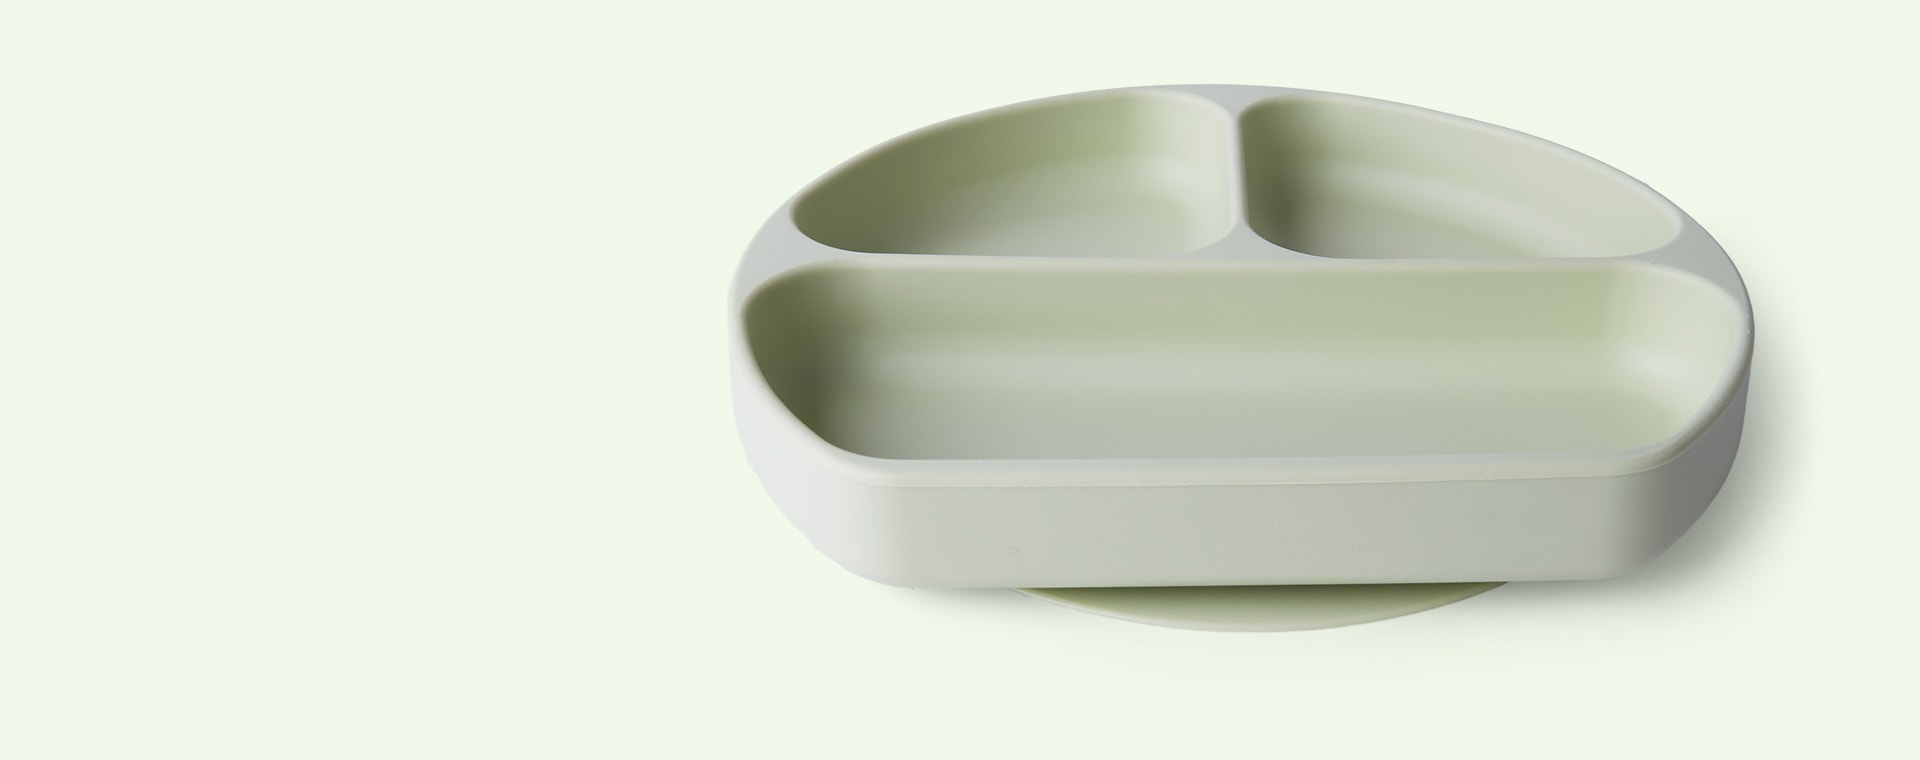 Sage Green Bumkins Silicone Suction Grip Dish